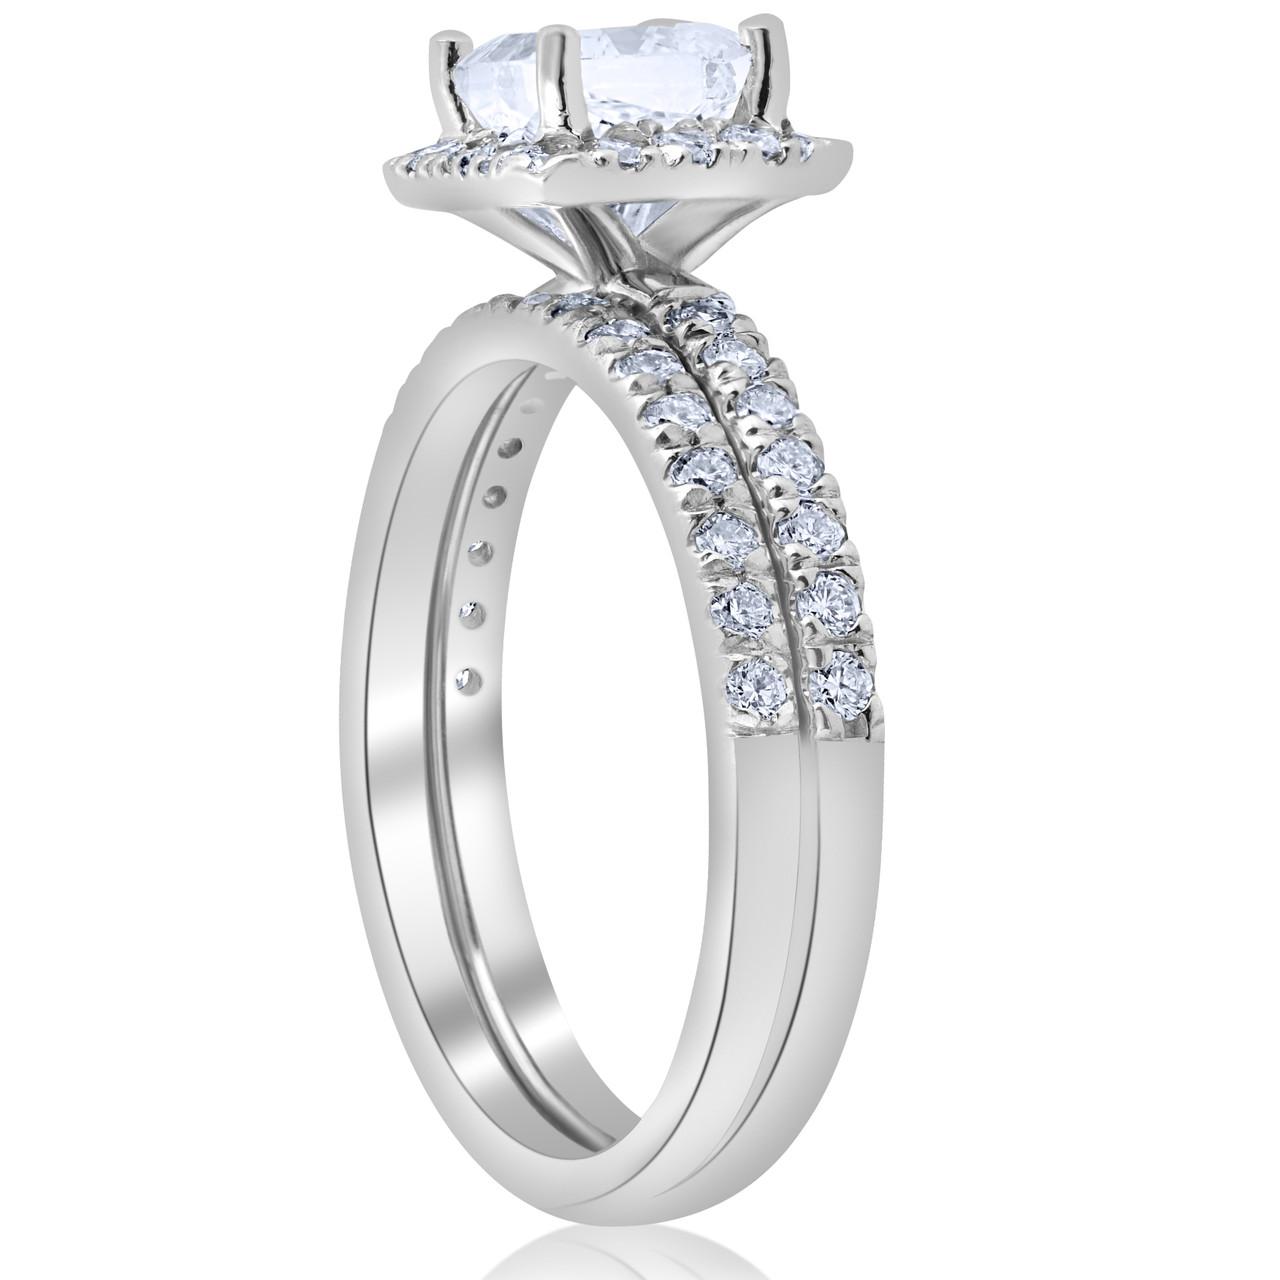 98b4e8bc6 1 5/8ct Certified Princess Cut Diamond Engagement Ring Set 14k White ...